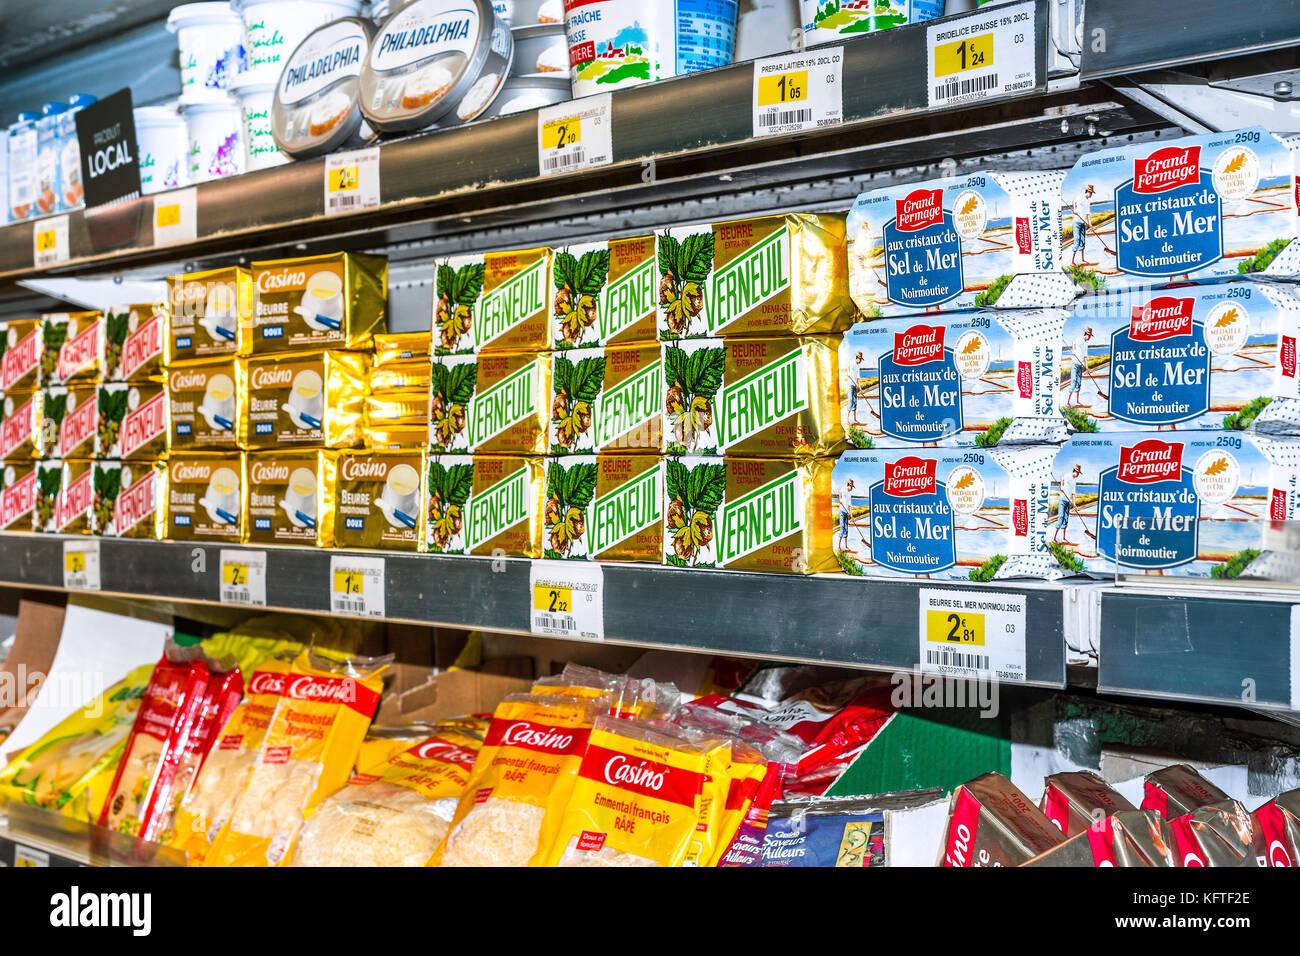 Packs of butter on shop shelf - France. - Stock Image